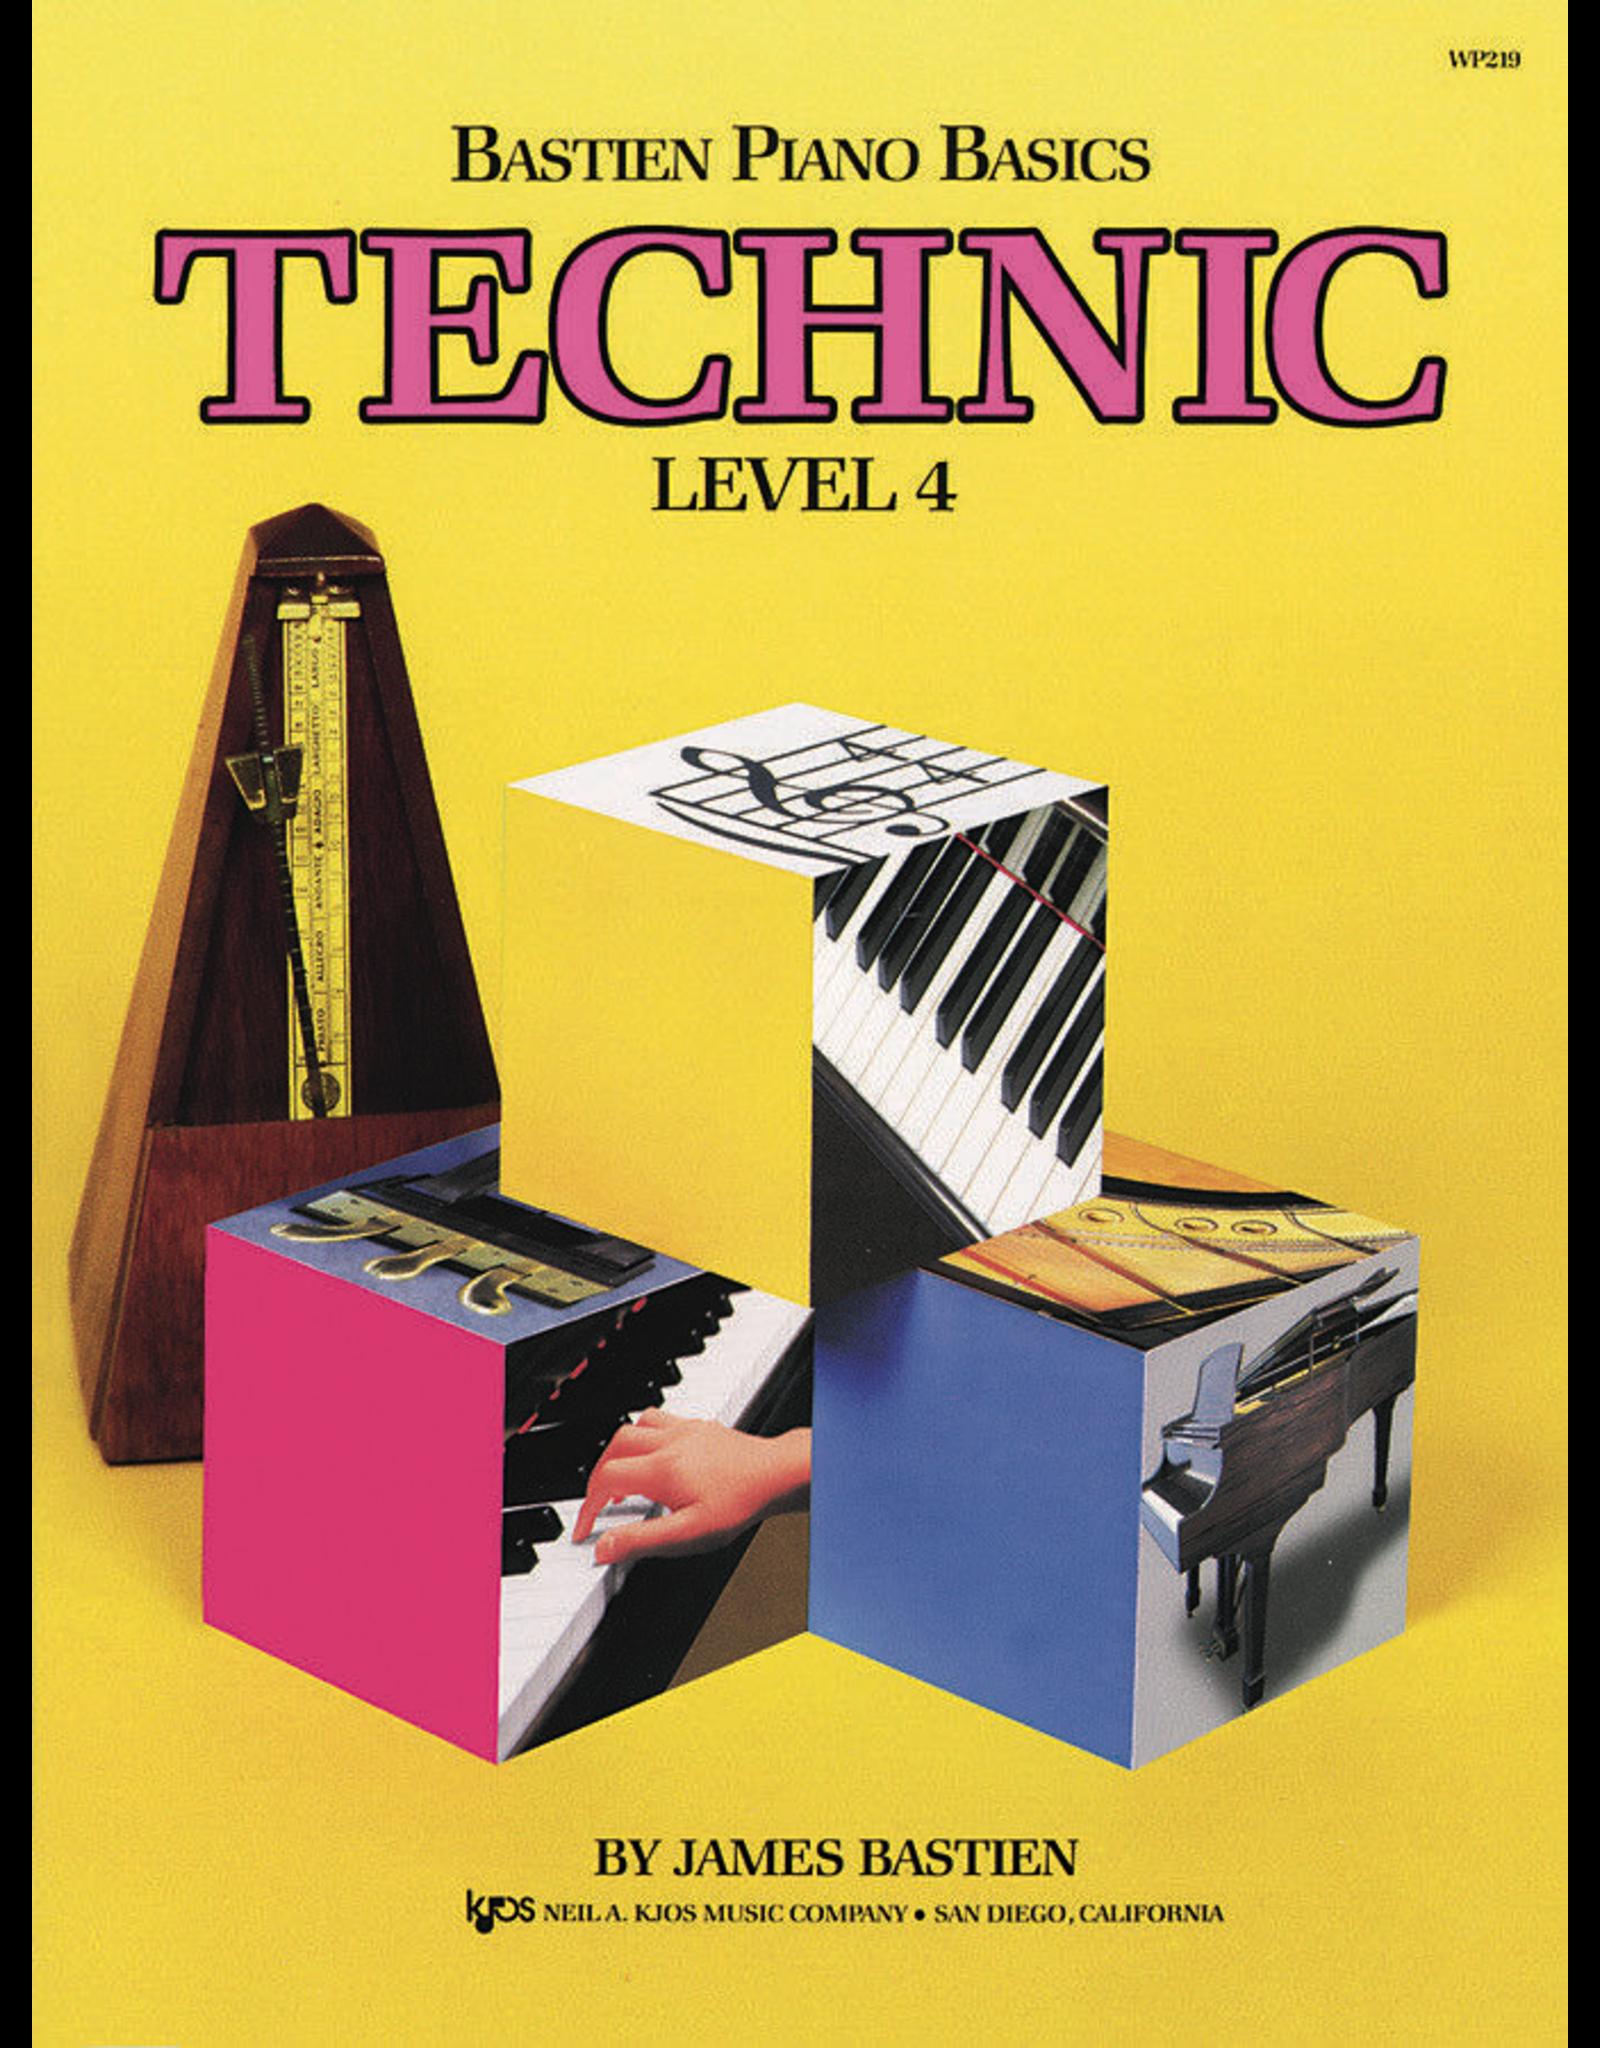 Kjos Bastien Piano Basics, Technic Level 4